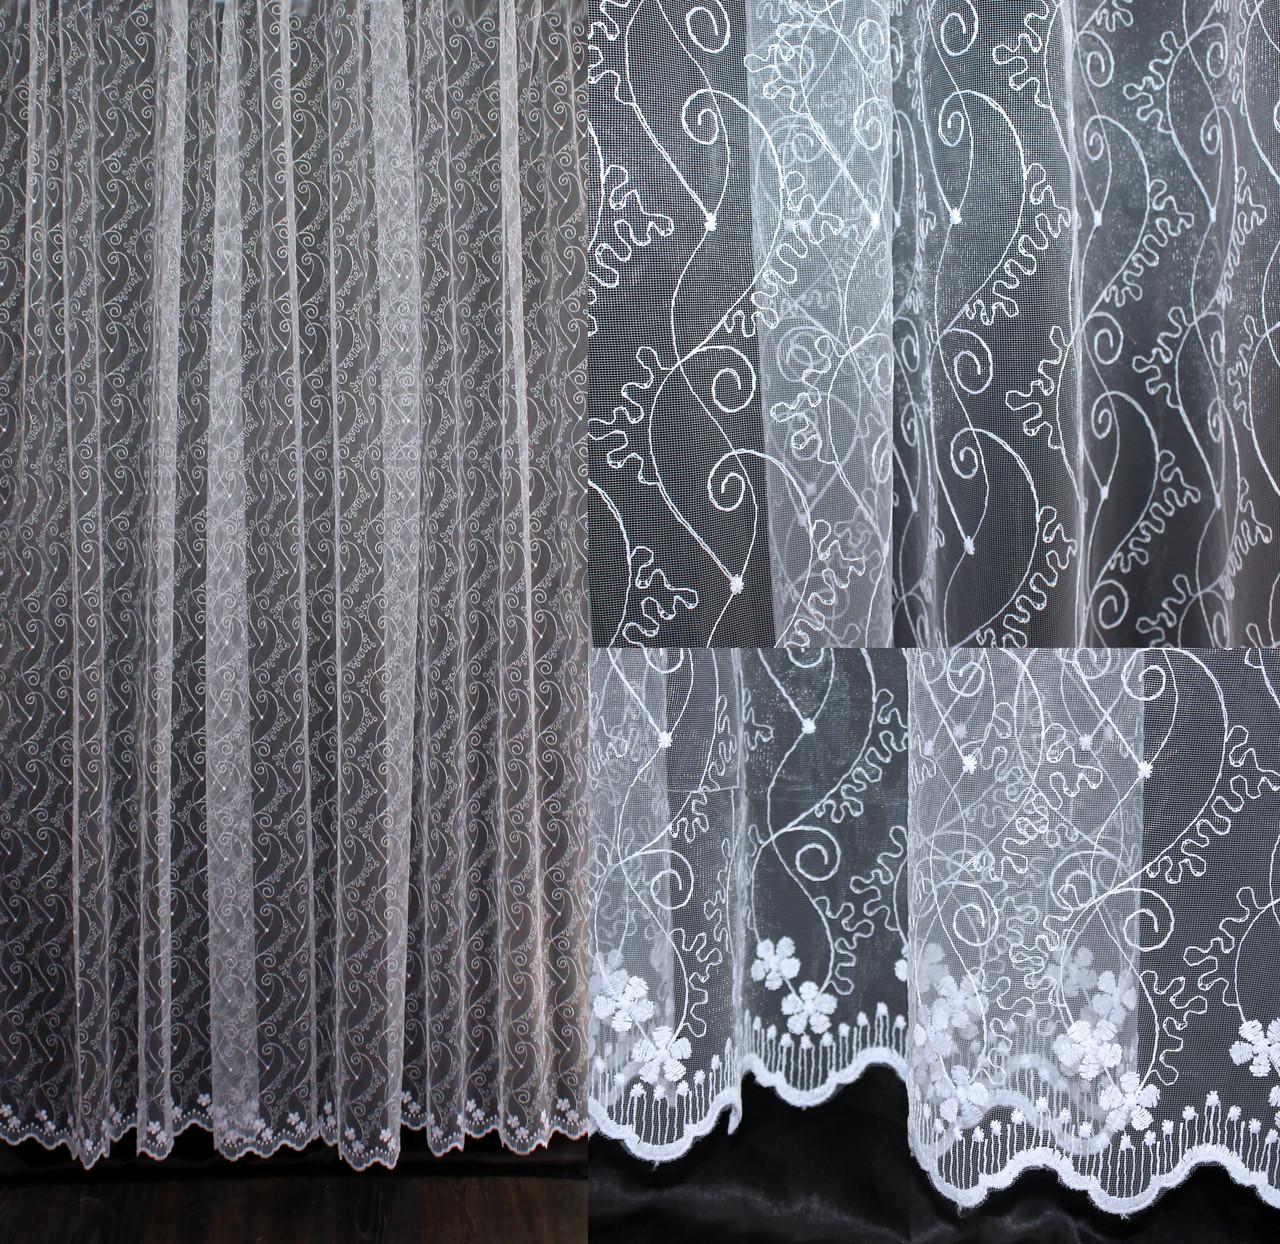 Гардина (3*2,5м) фатин с вышивкой. Цвет белый. Код 542т 40-210